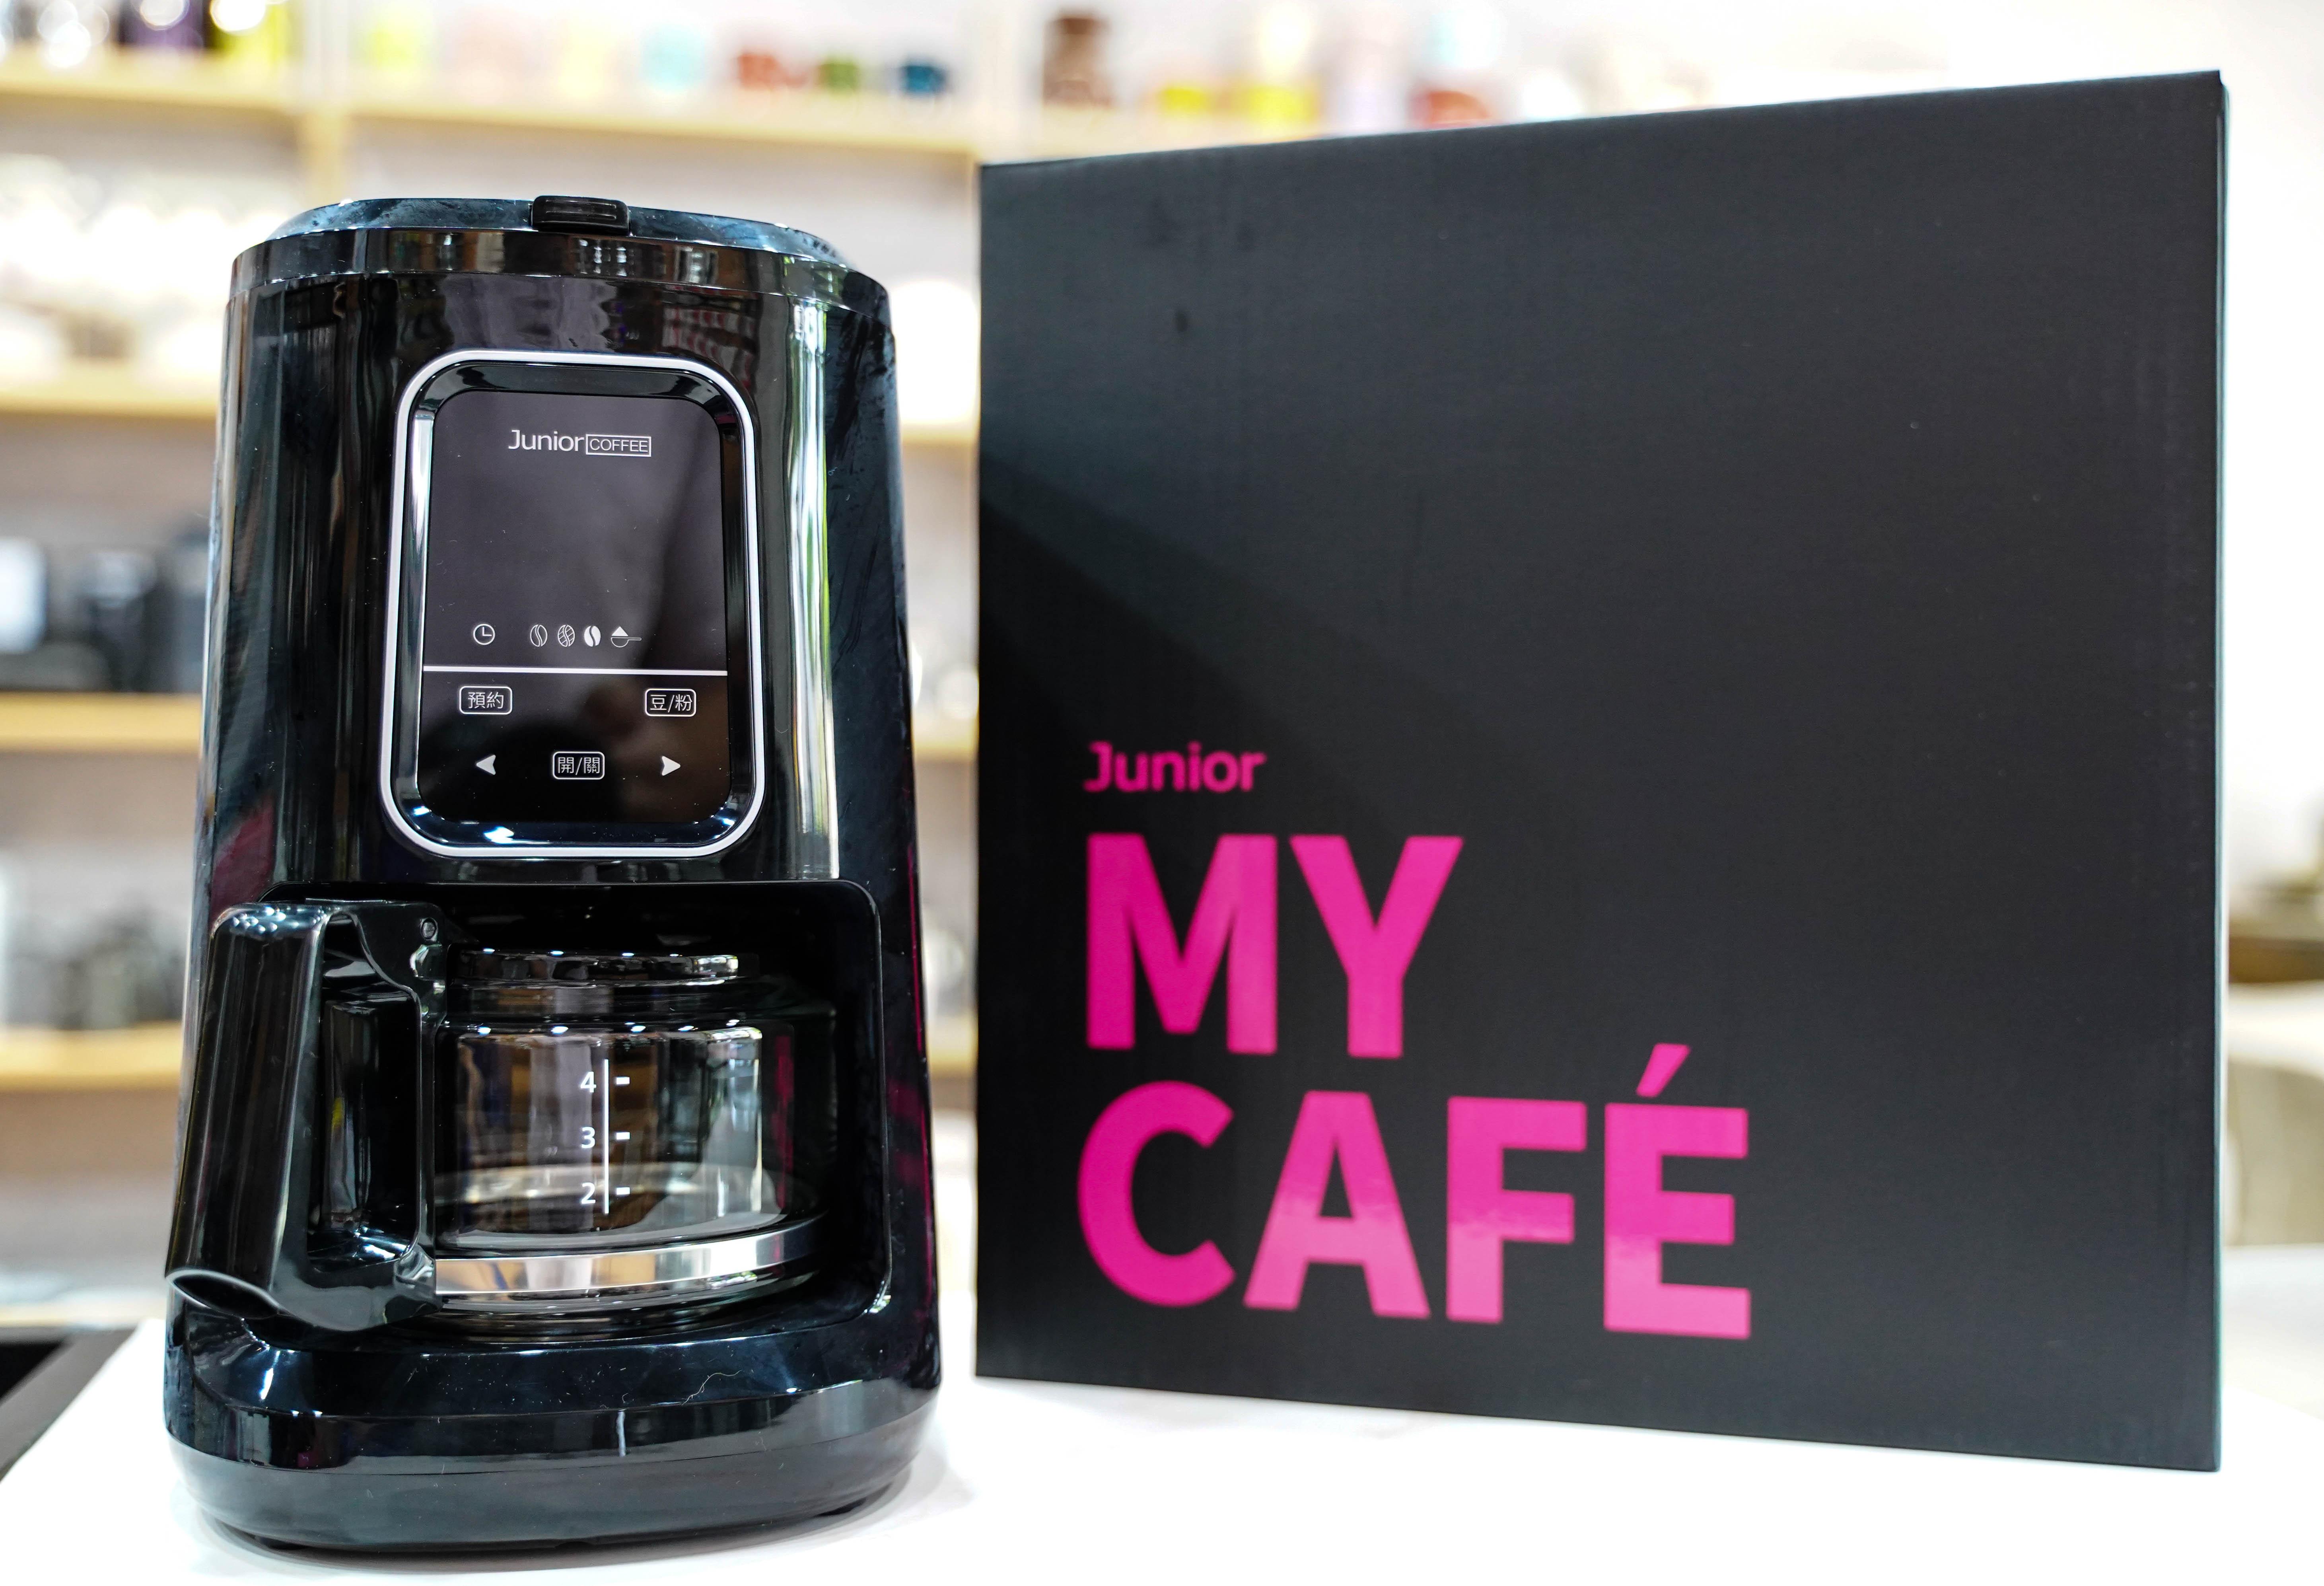 JUNIOR 全自動美式咖啡機 豆 / 粉兩用 可定時預約沖煮 贈咖啡豆 『93 coffee wholesale』 1